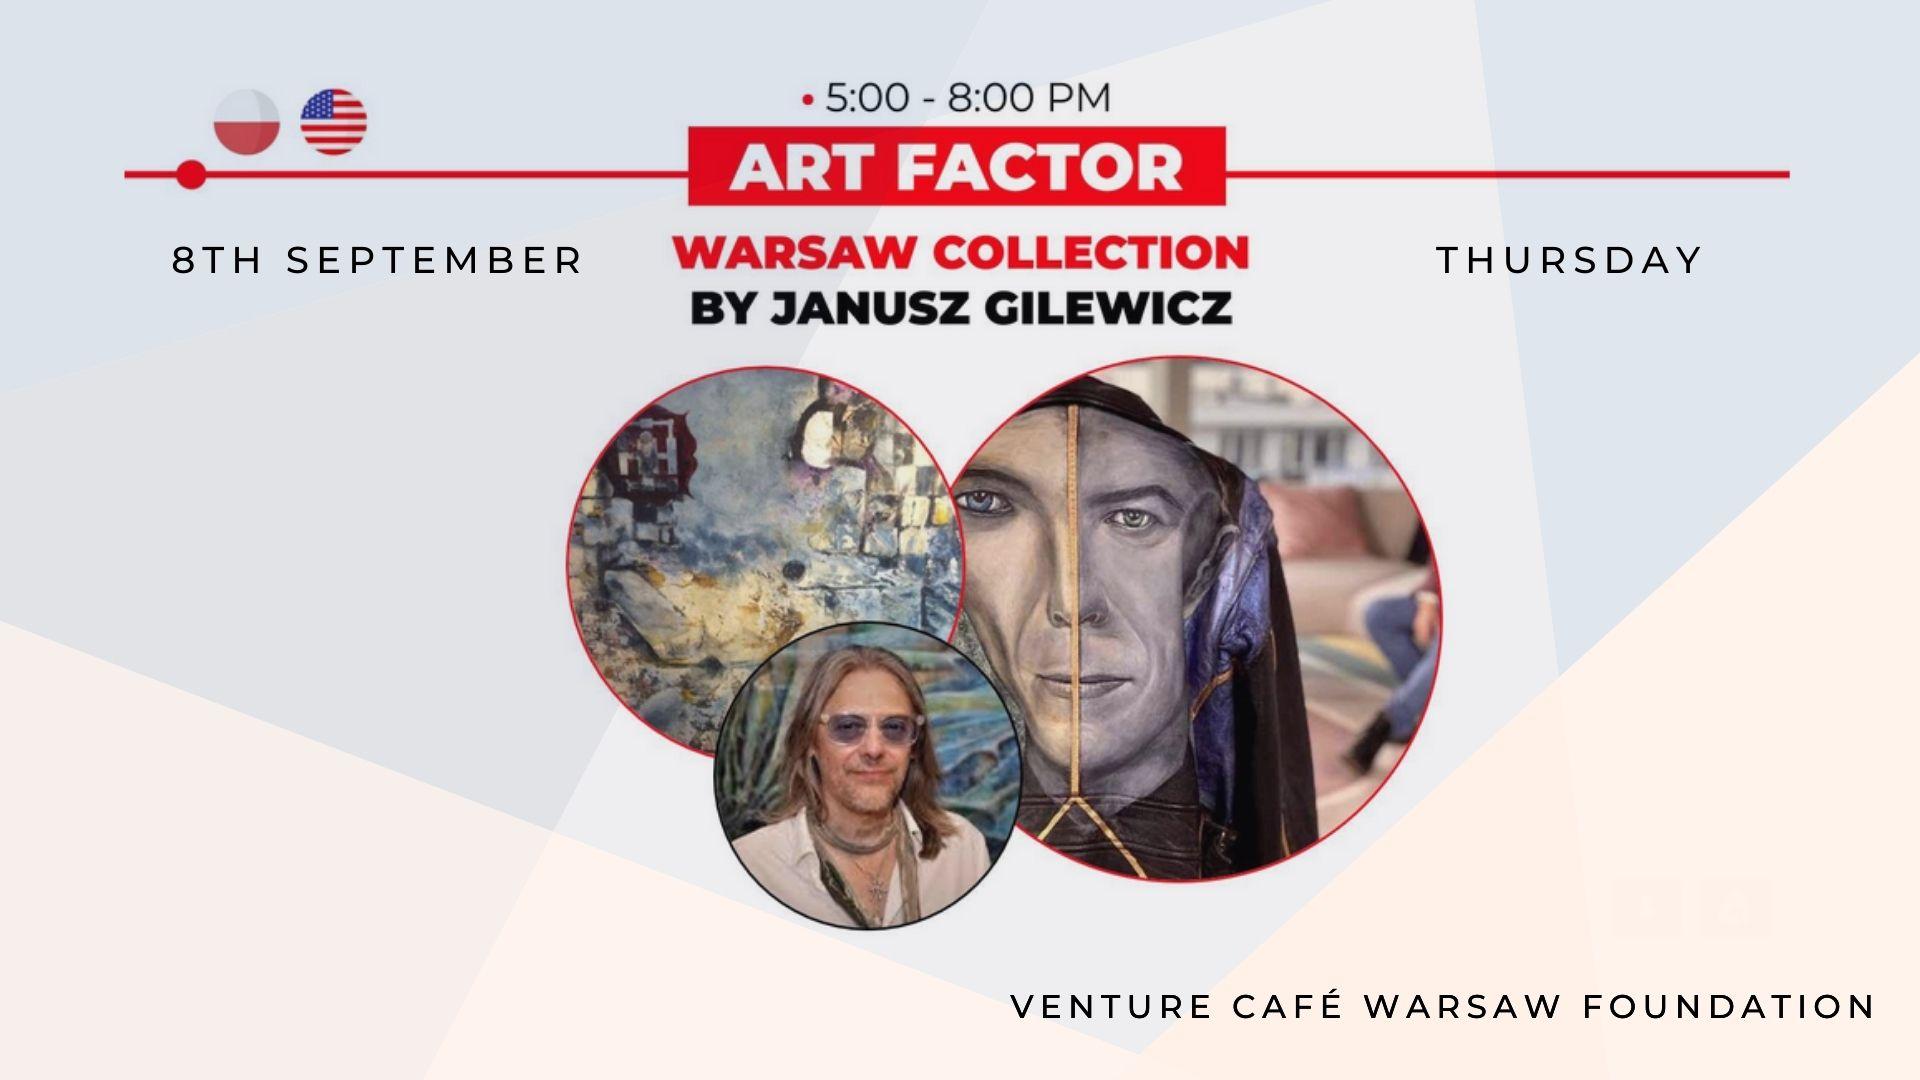 Warsaw Art Collection by Janusz Gilewicz